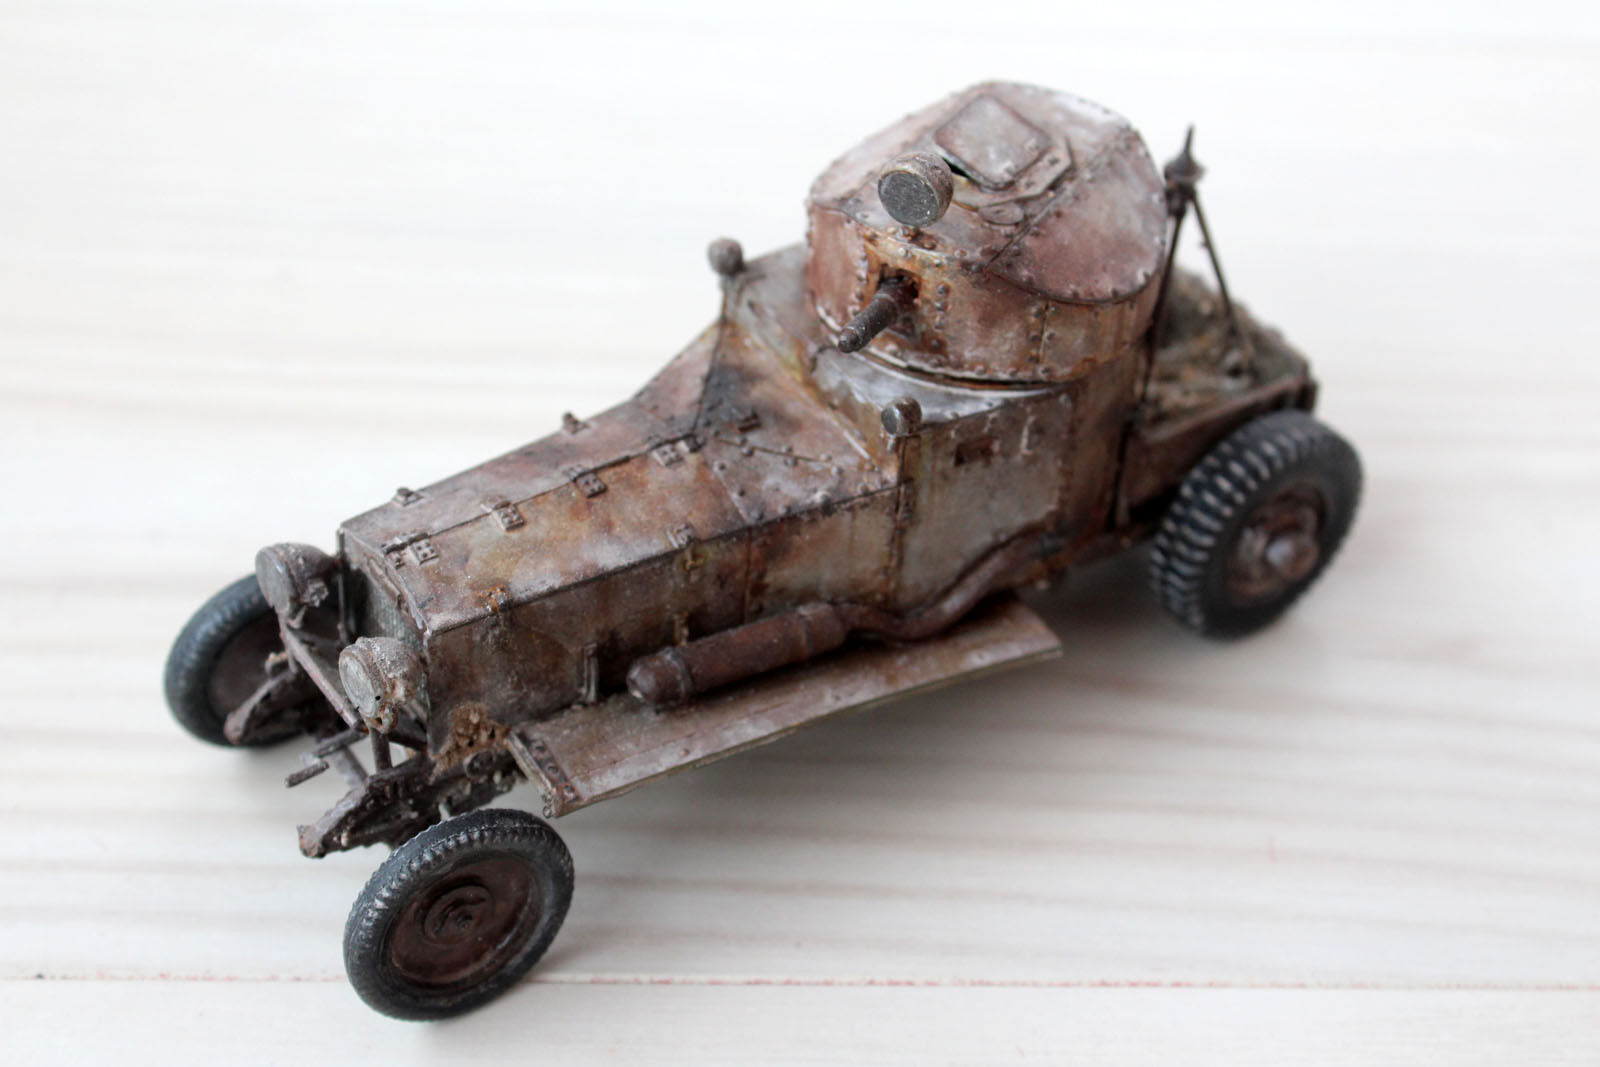 Rolls royce c 68 1 35 scale Armored scratch